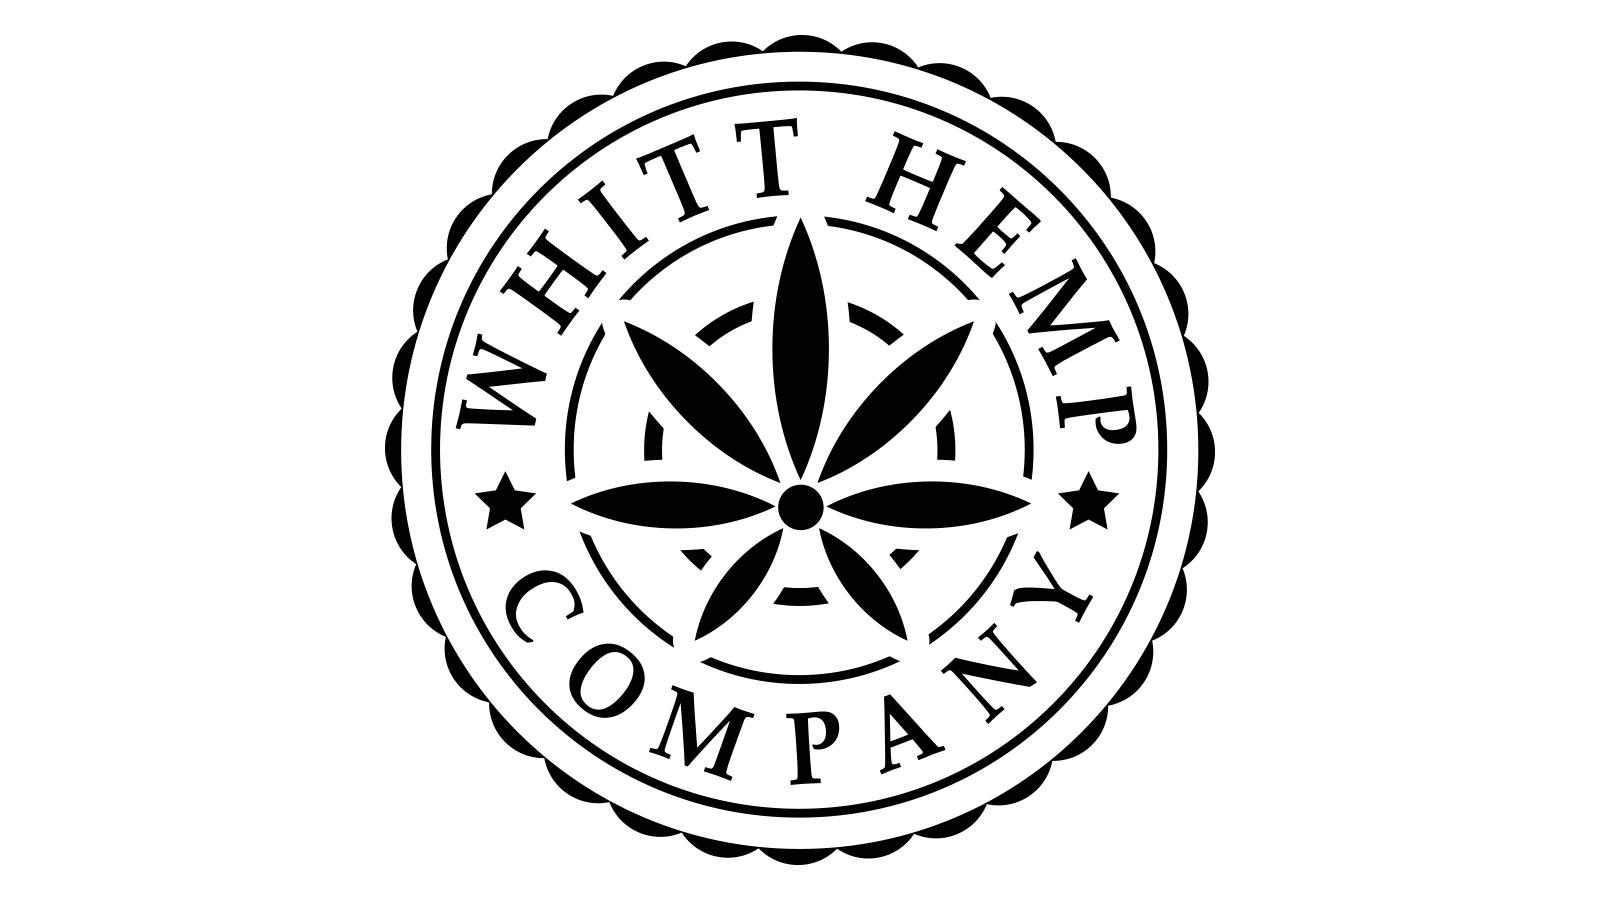 Whitt Hemp CBD Company